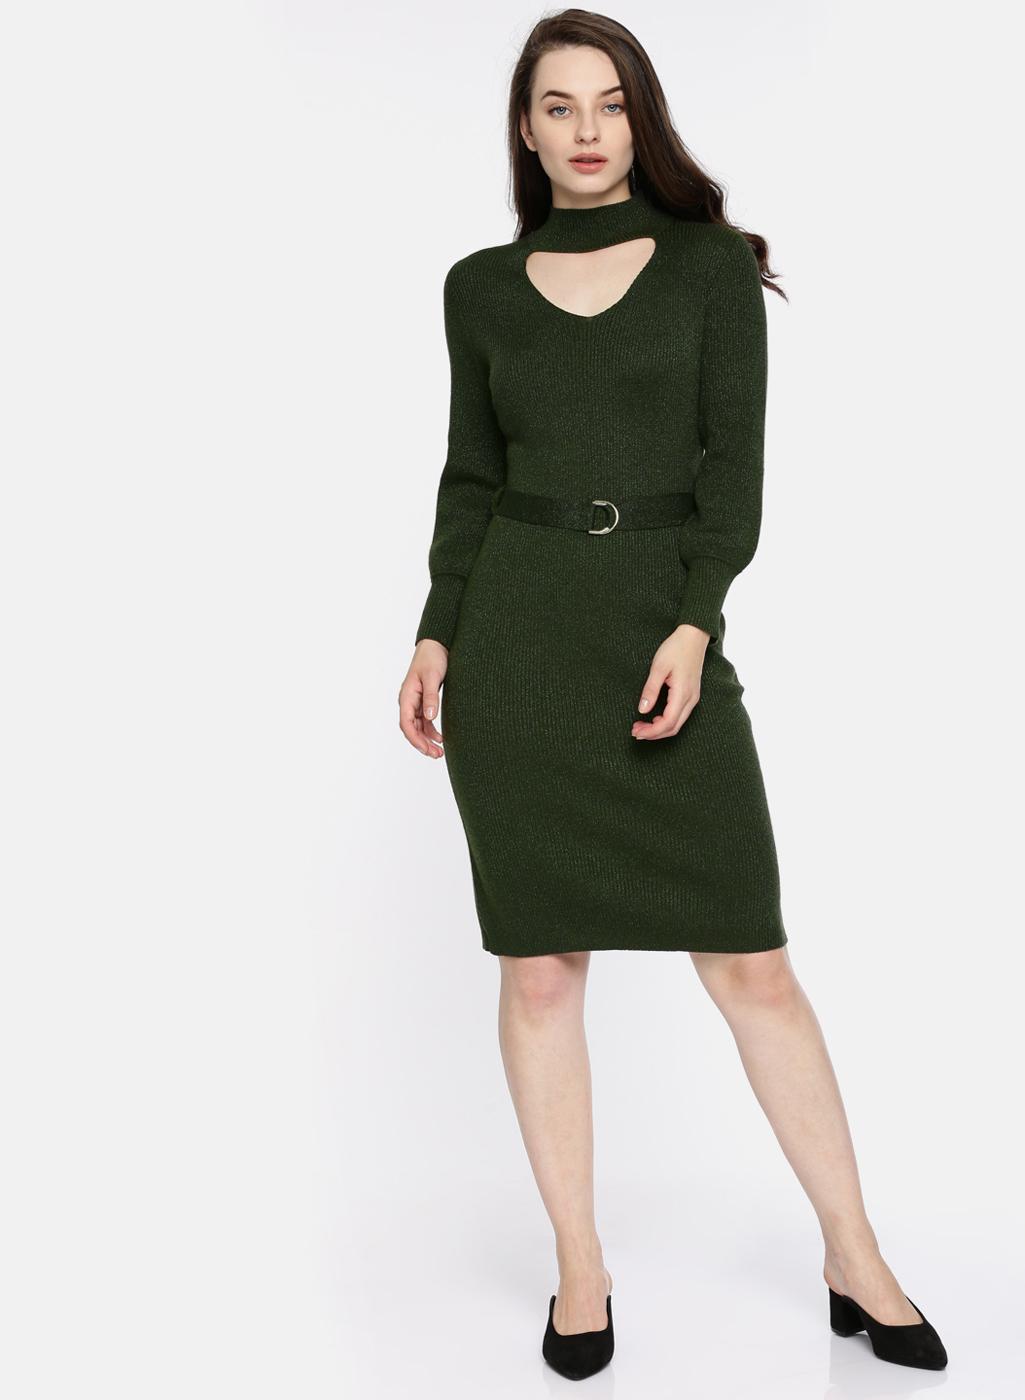 704eaca44e Buy Green Self Design Sweater Dress Online | DTashion.com